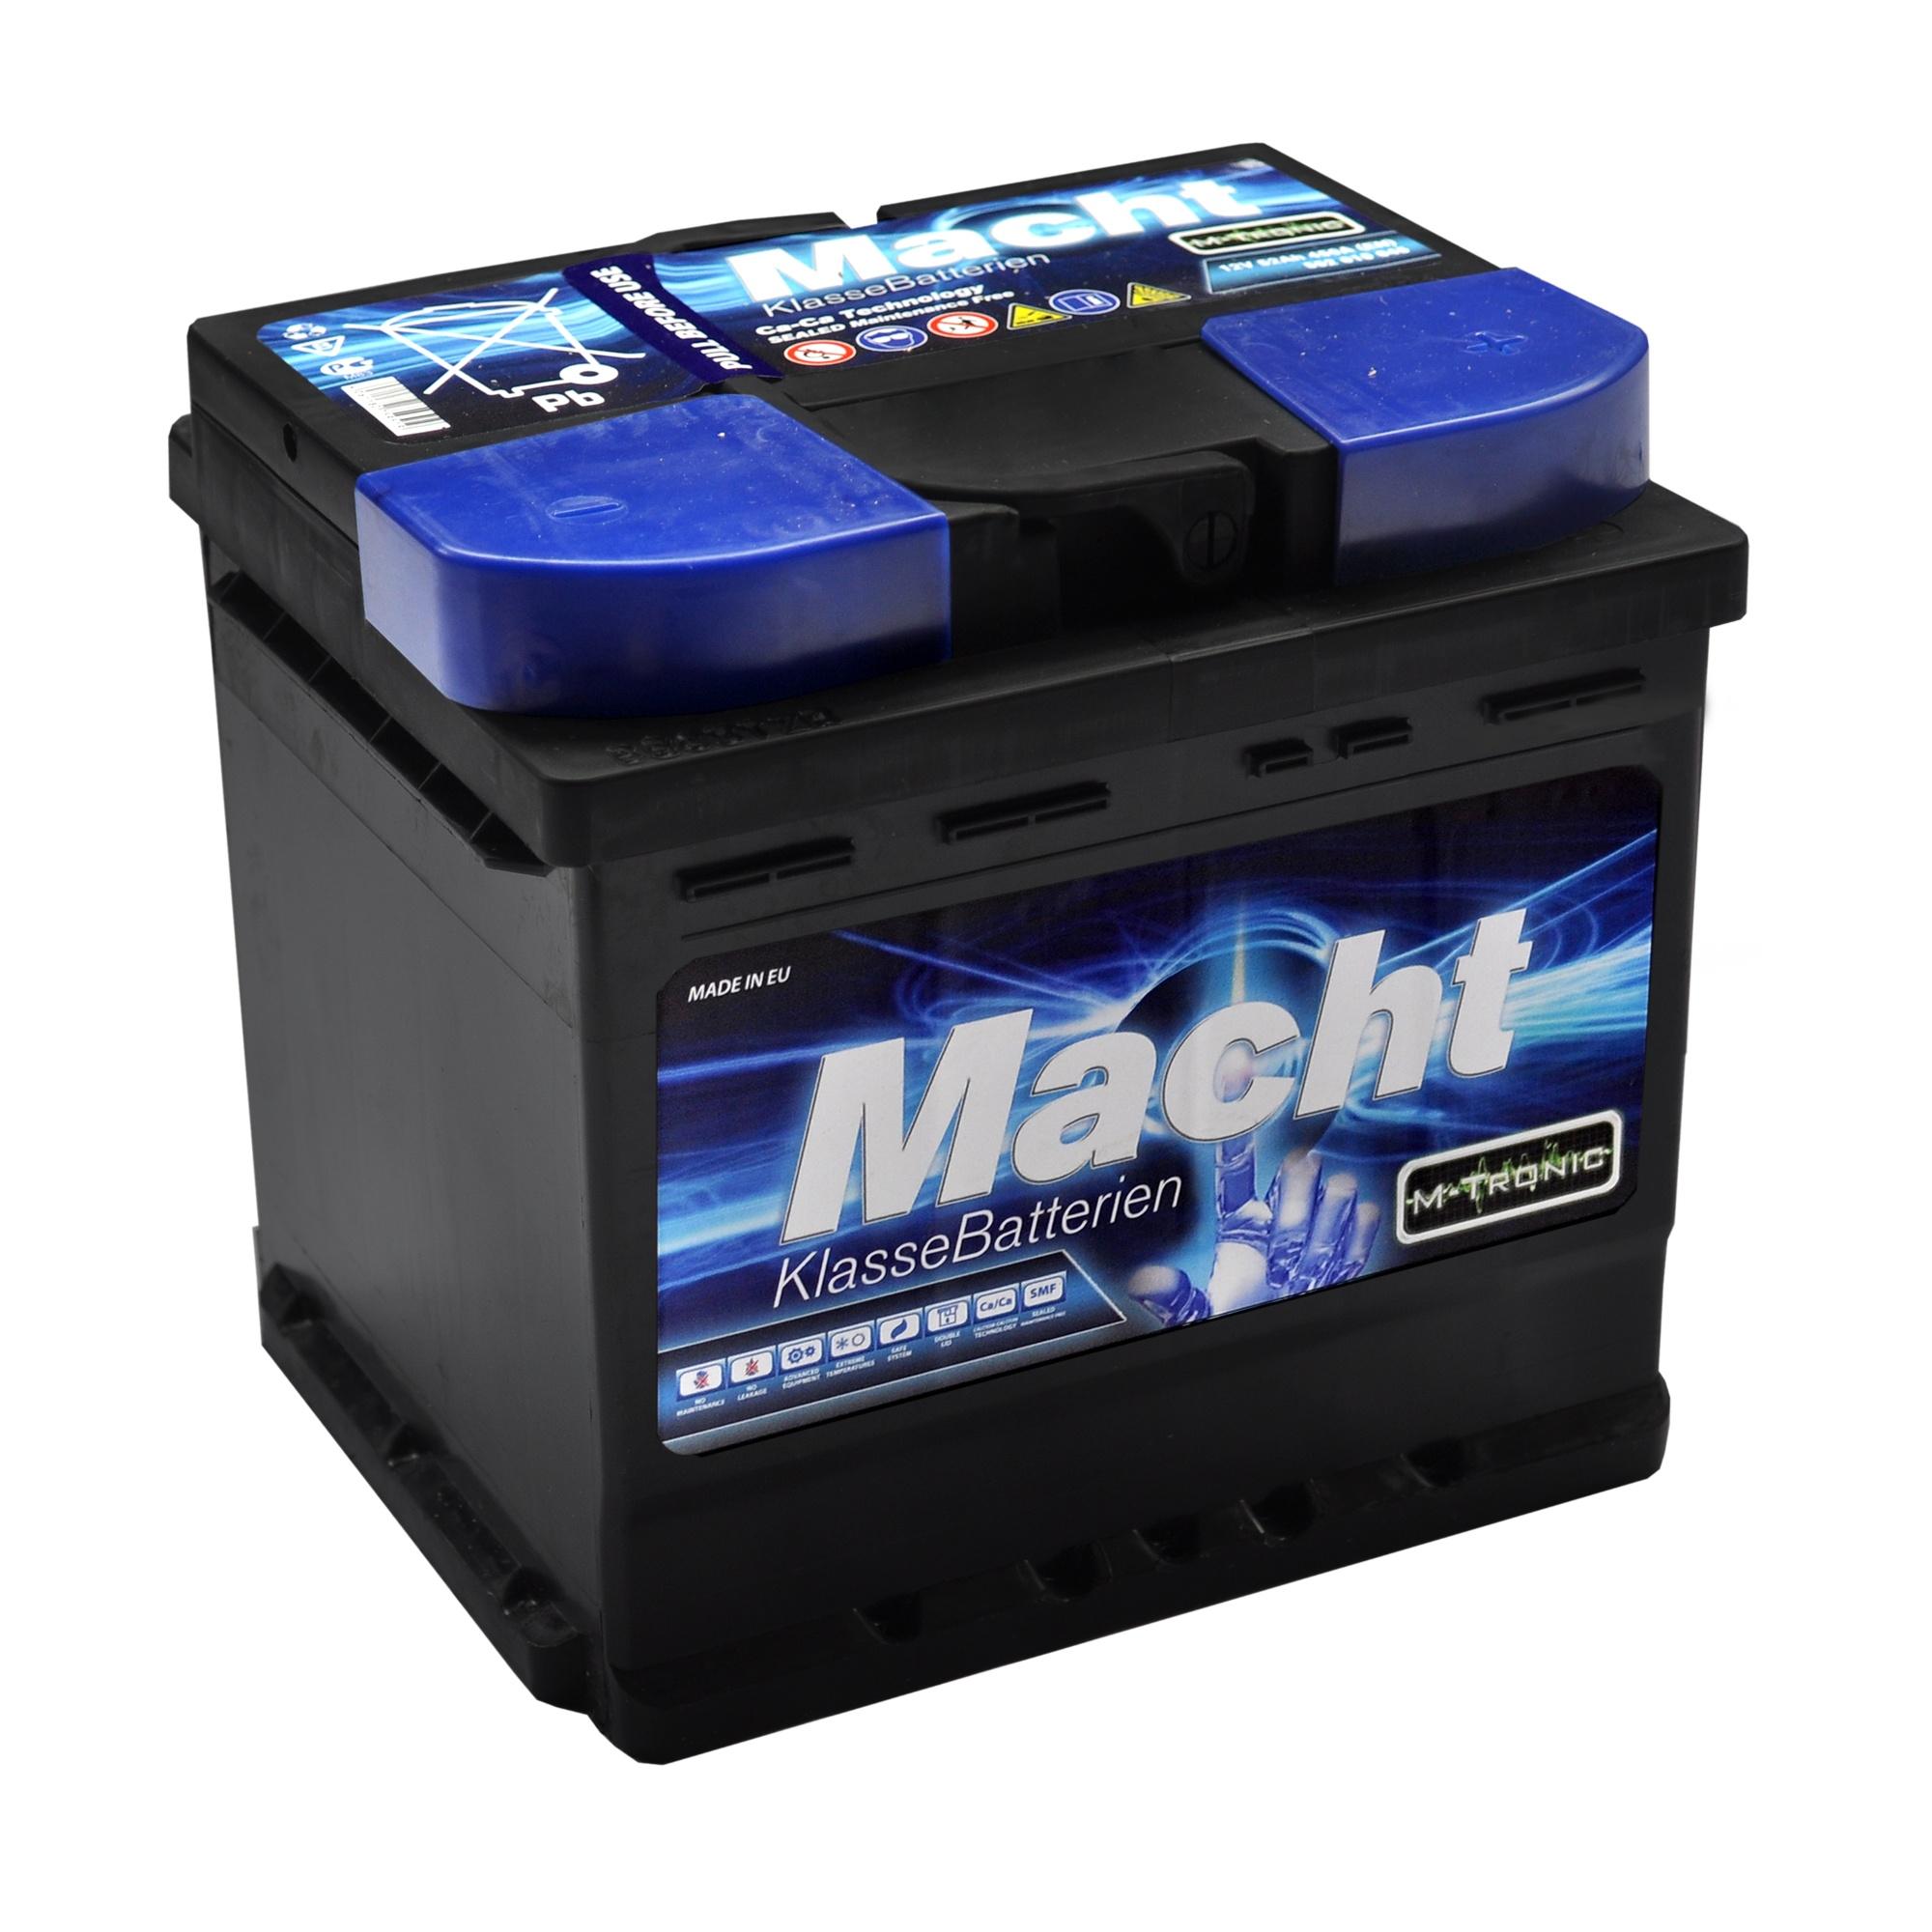 Baterie auto MACHT 25632 M-Tronic 12V 52 Ah 450A - 3 ANI GARANTIE